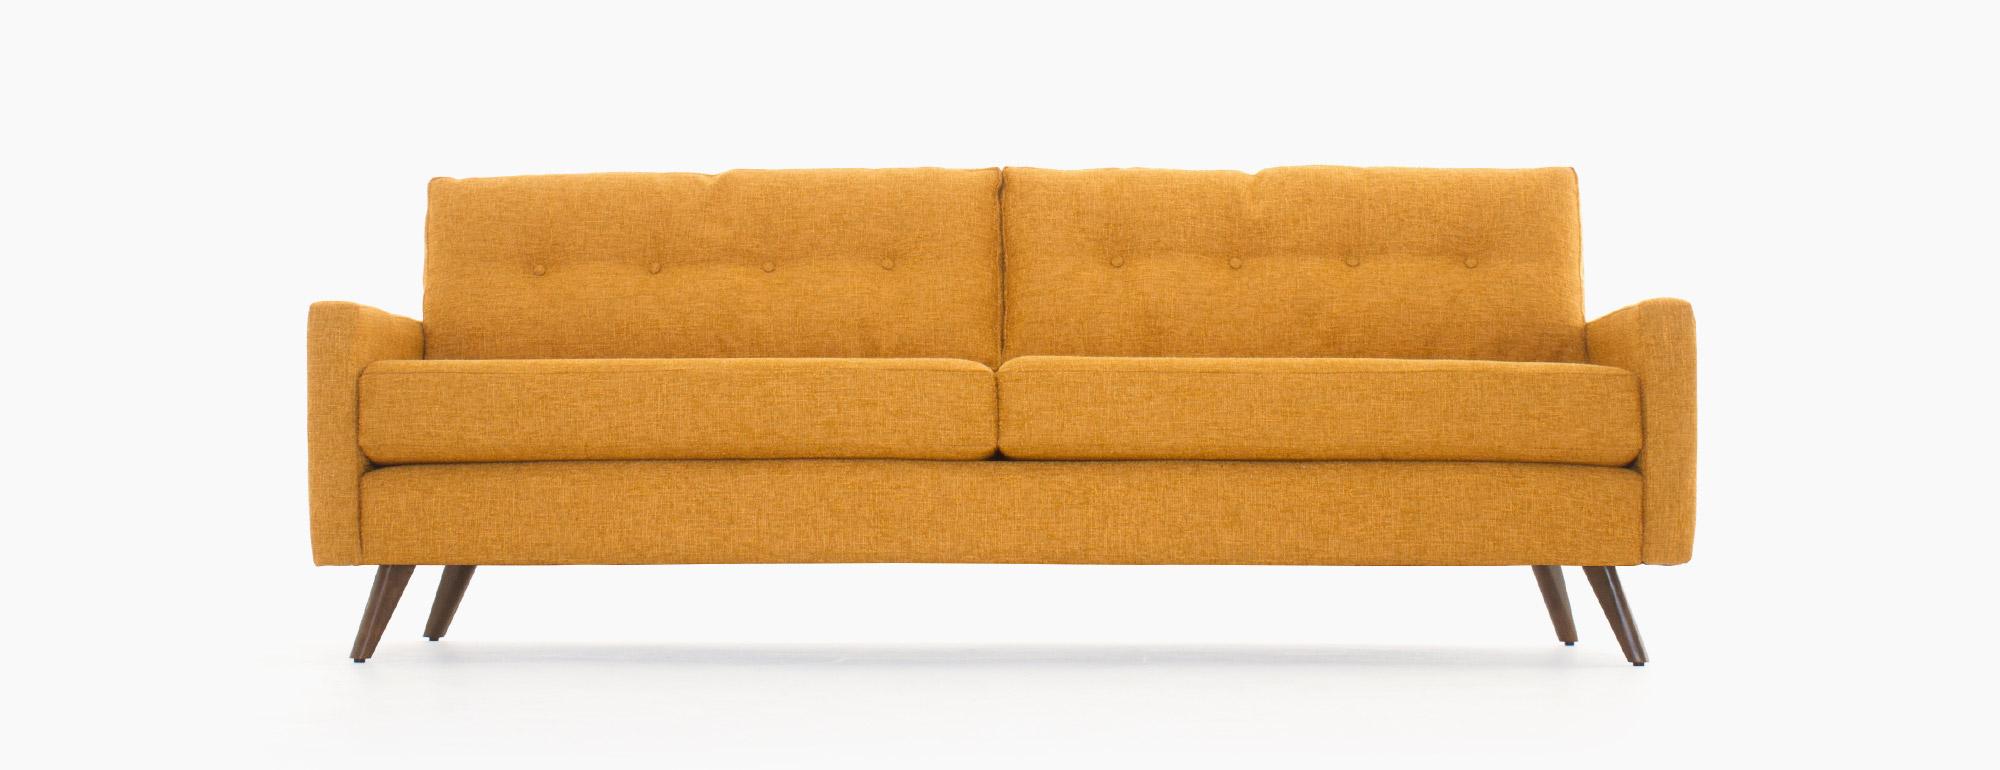 hero-colston-sofa-1